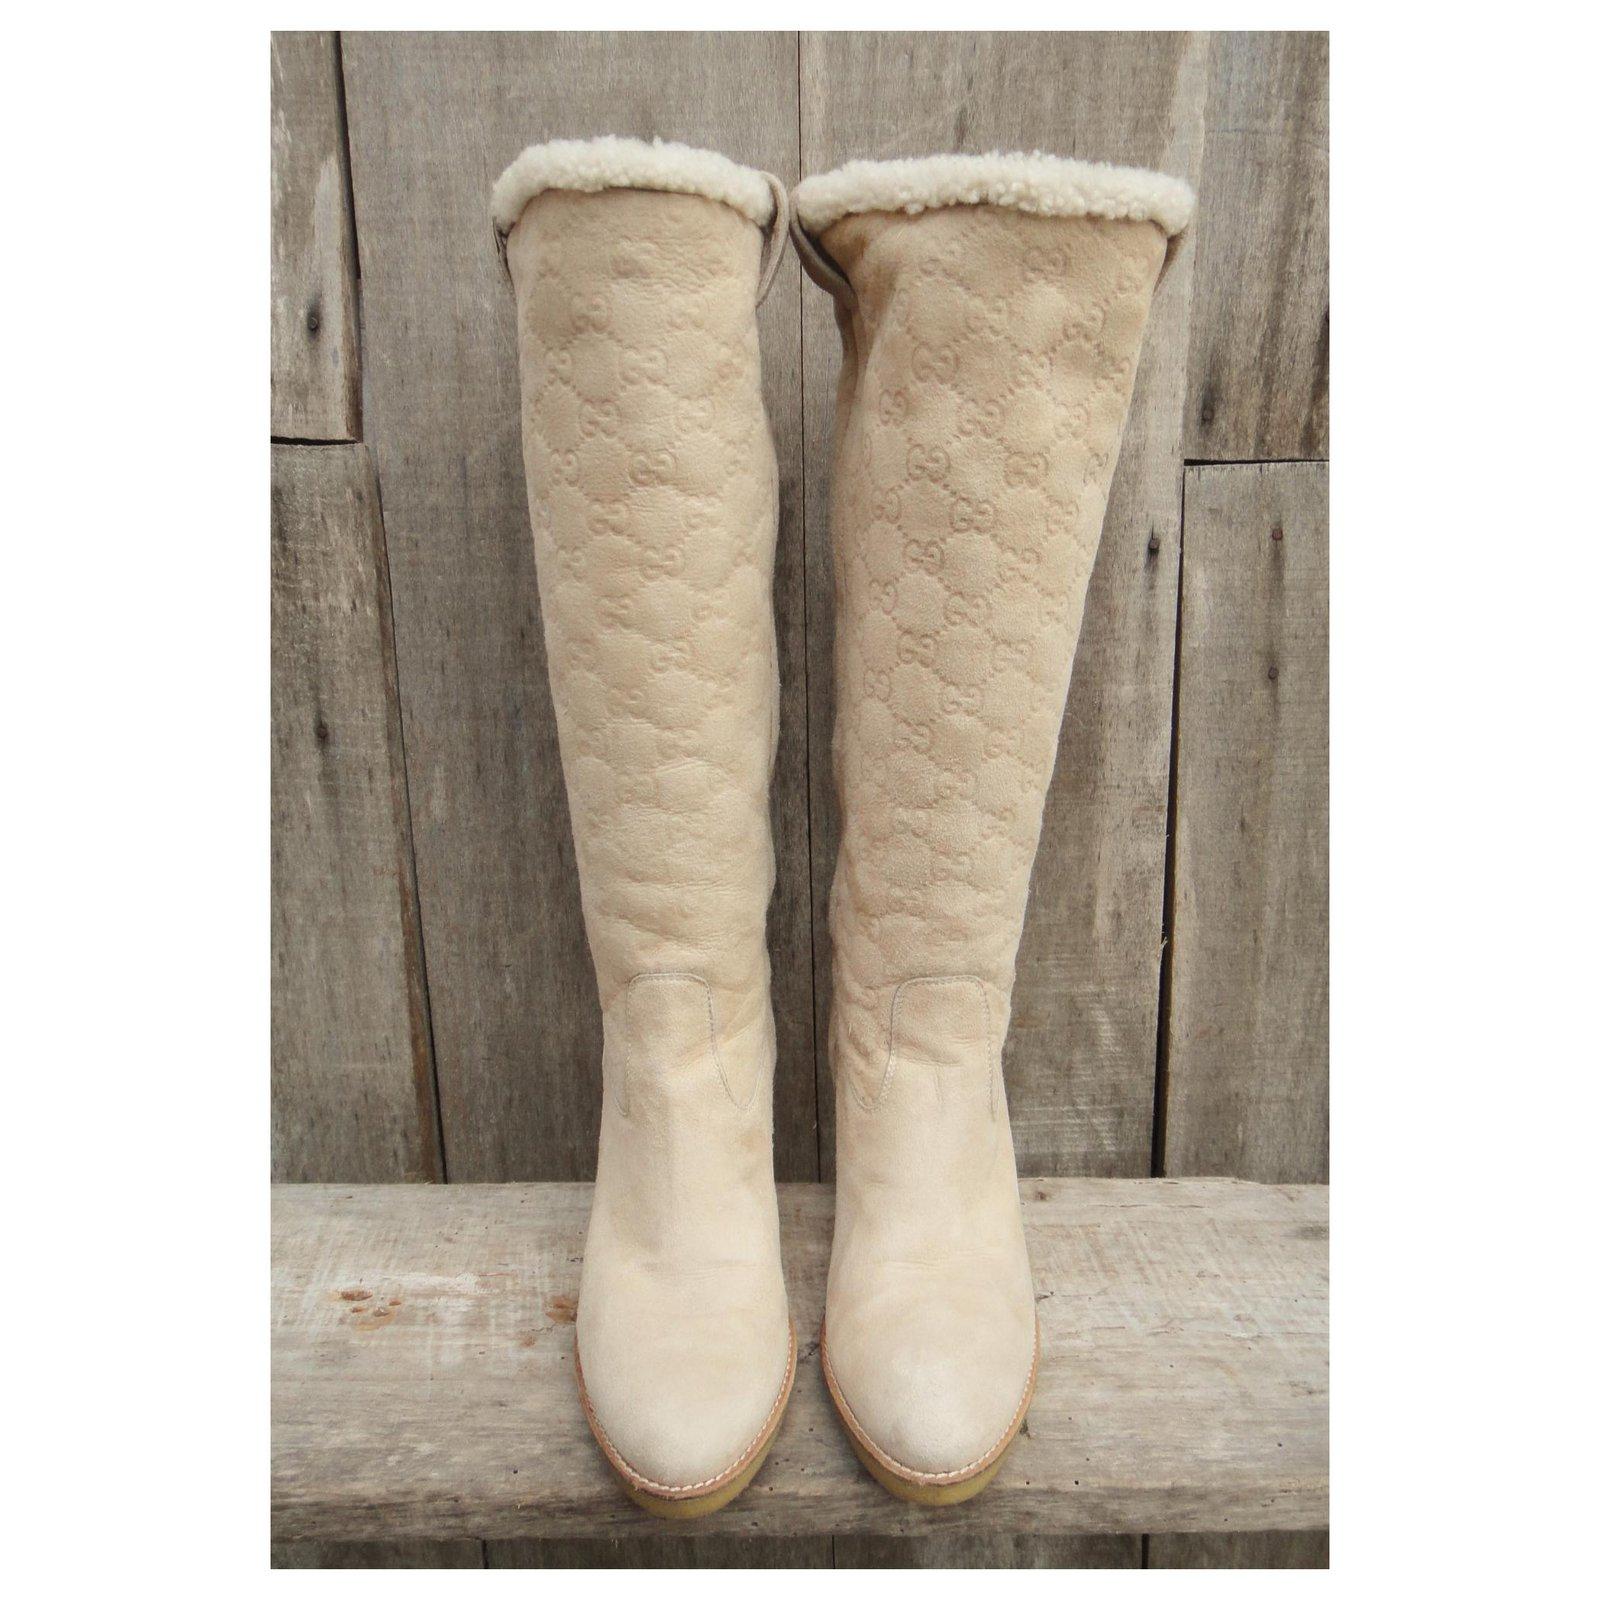 2756bde2e Gucci Gucci boots in sheep returned (shearling) Boots Deerskin Eggshell  ref.118871 - Joli Closet